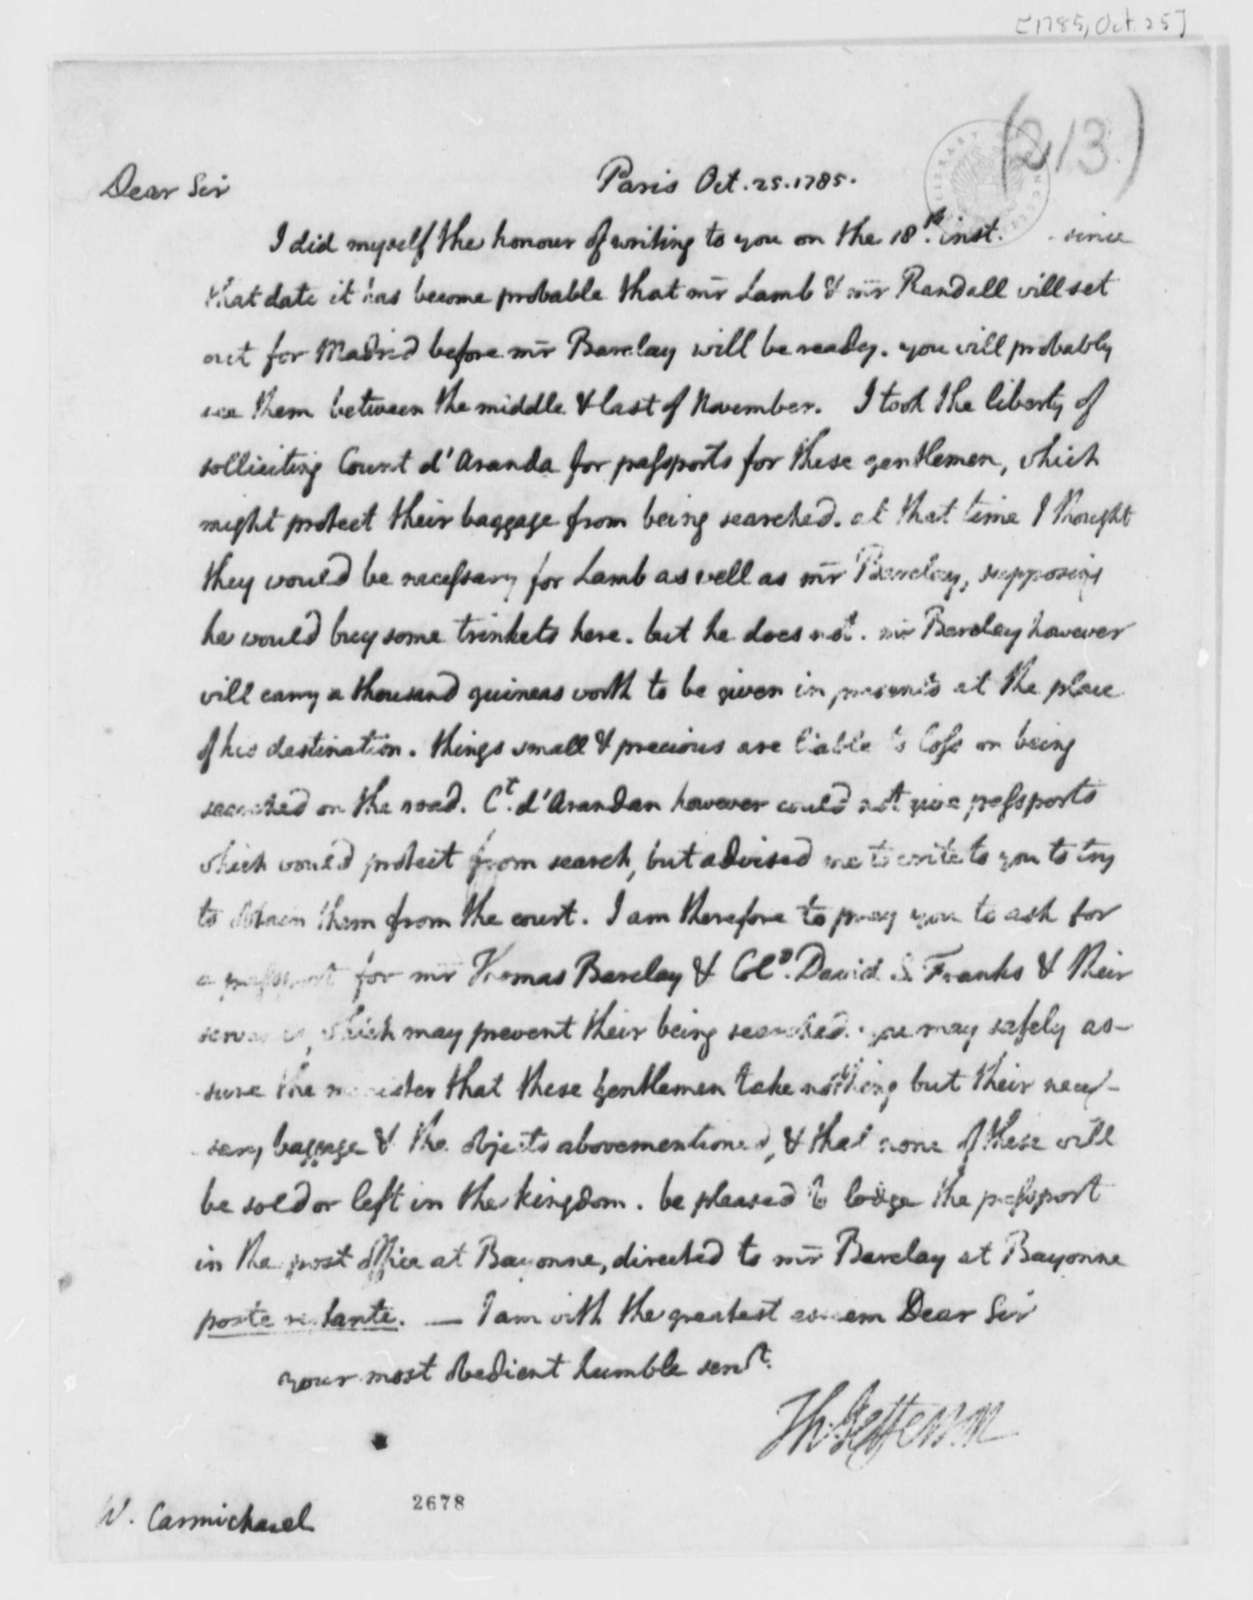 Thomas Jefferson to William Carmichael, October 25, 1785